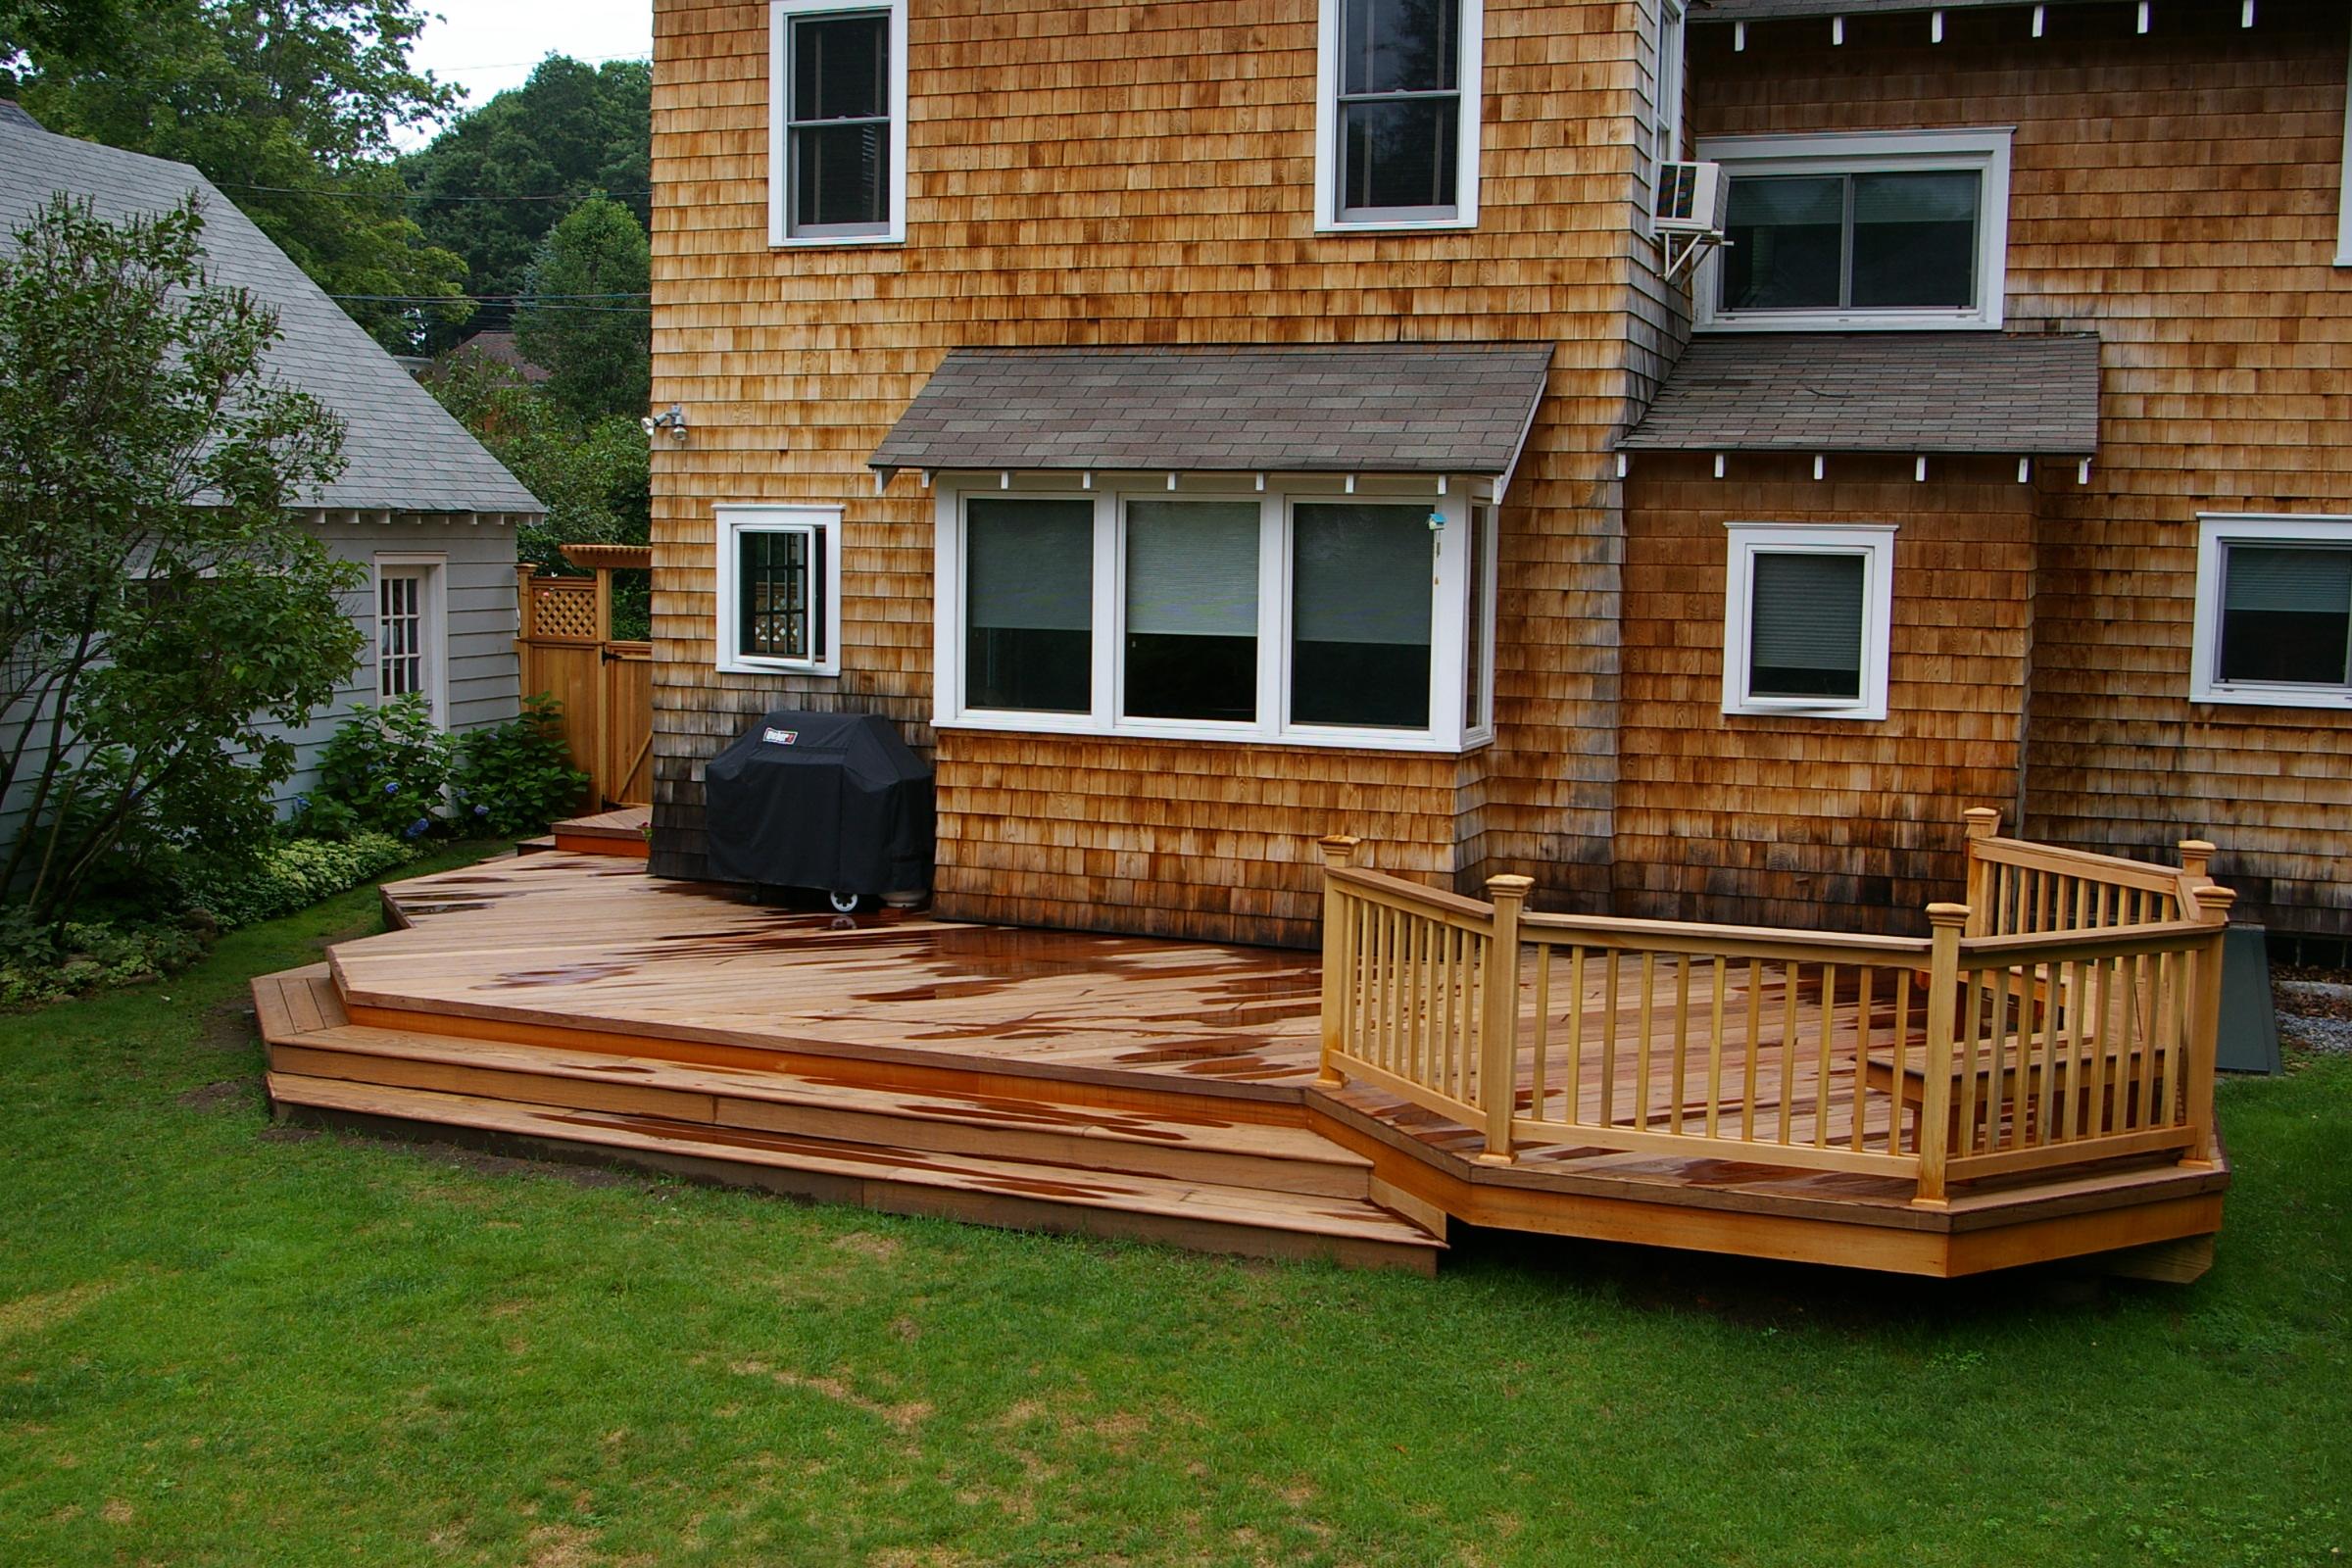 Wood Decks and High Outdoor Heat | Custom Decks of ... on Wood Deck Ideas For Backyard  id=41404